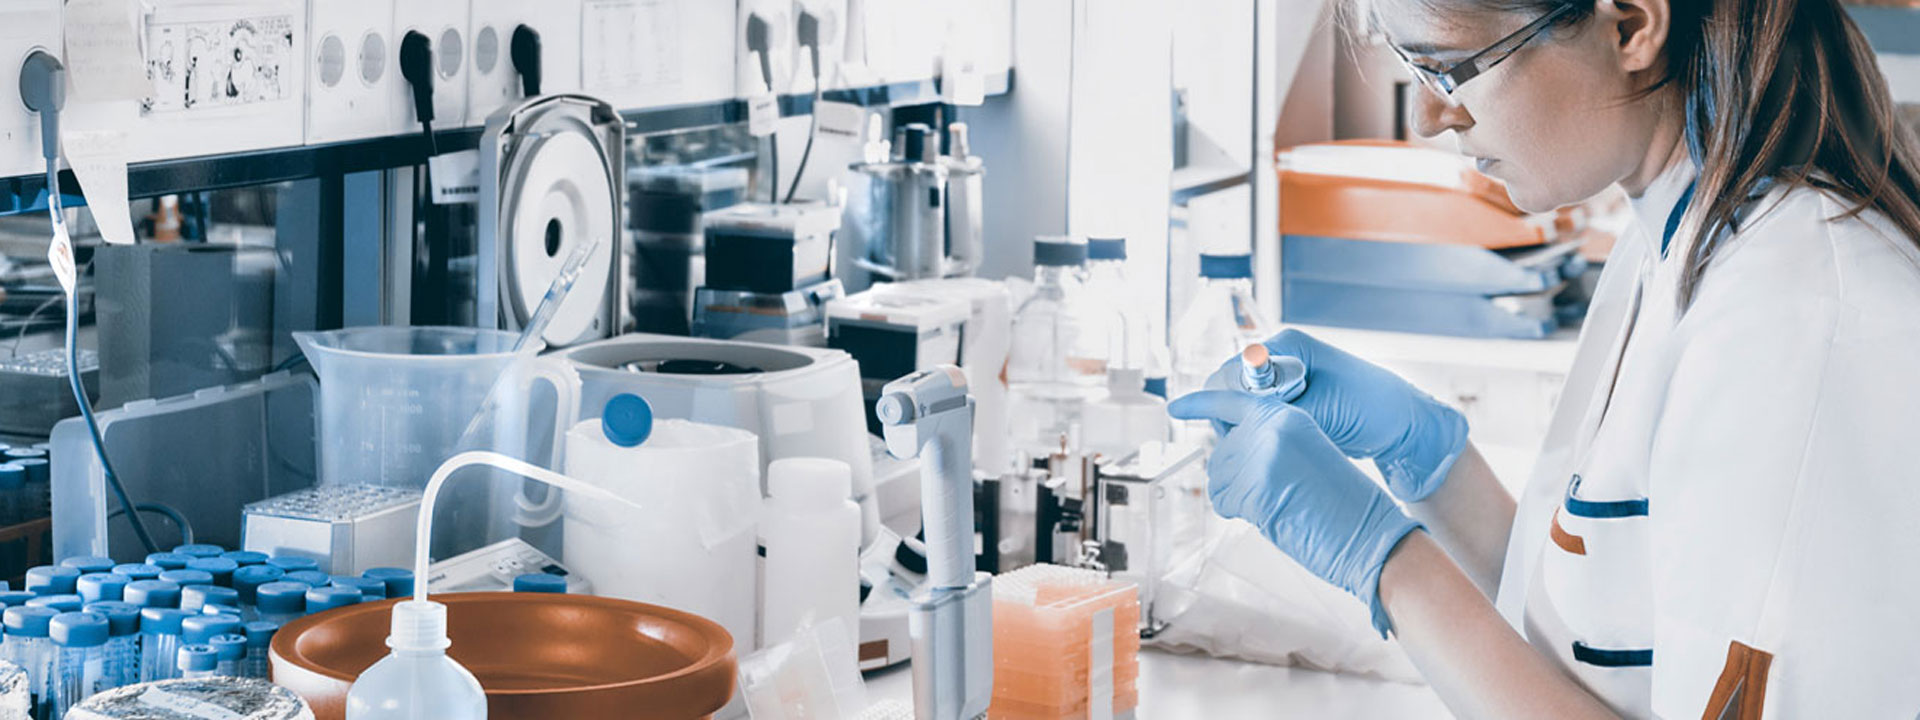 Naqaa Medical Center Lebanon - Laboratory